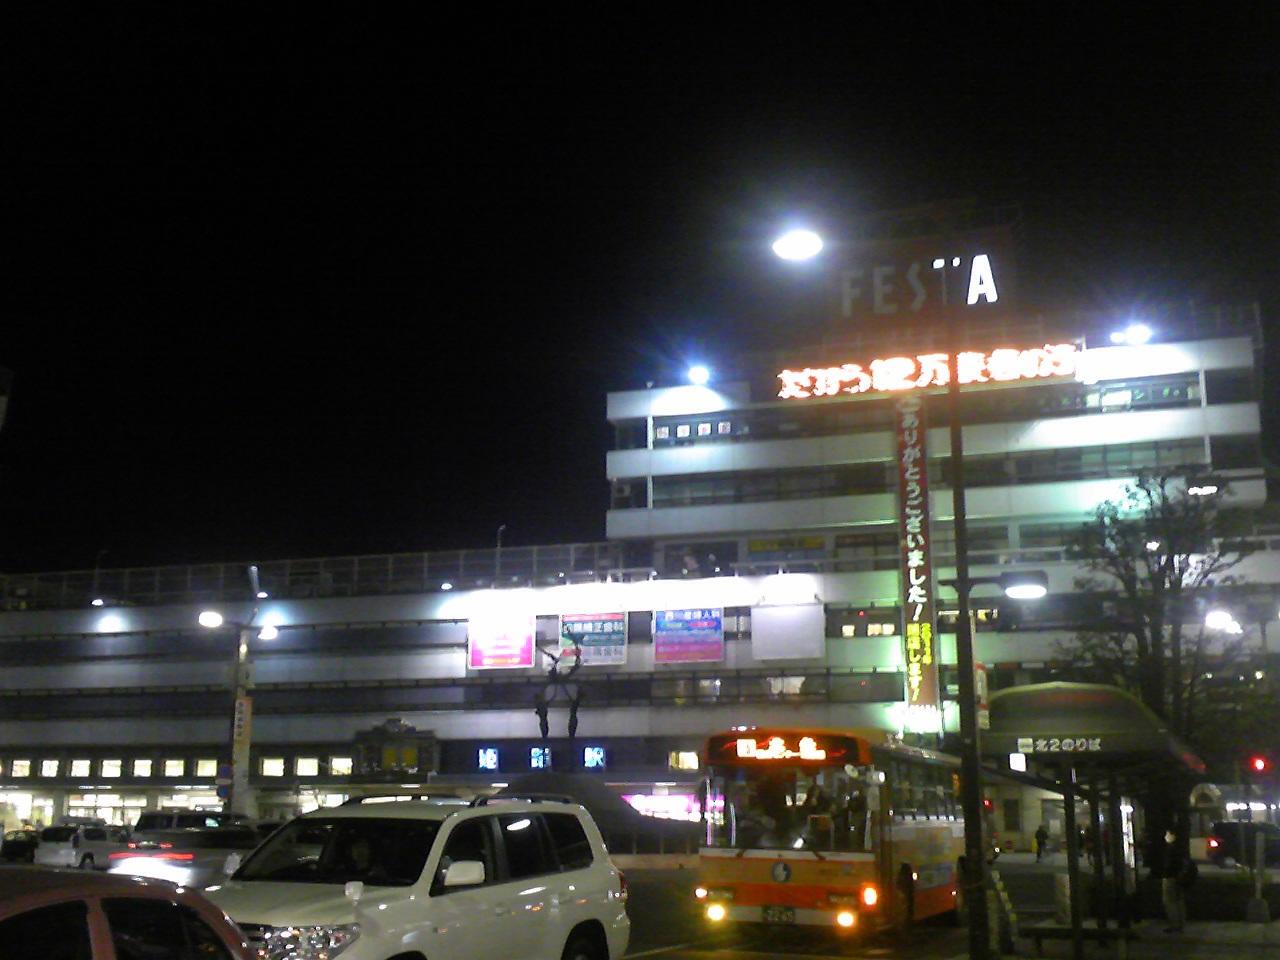 079/Rail)姫路駅ビルお役御免